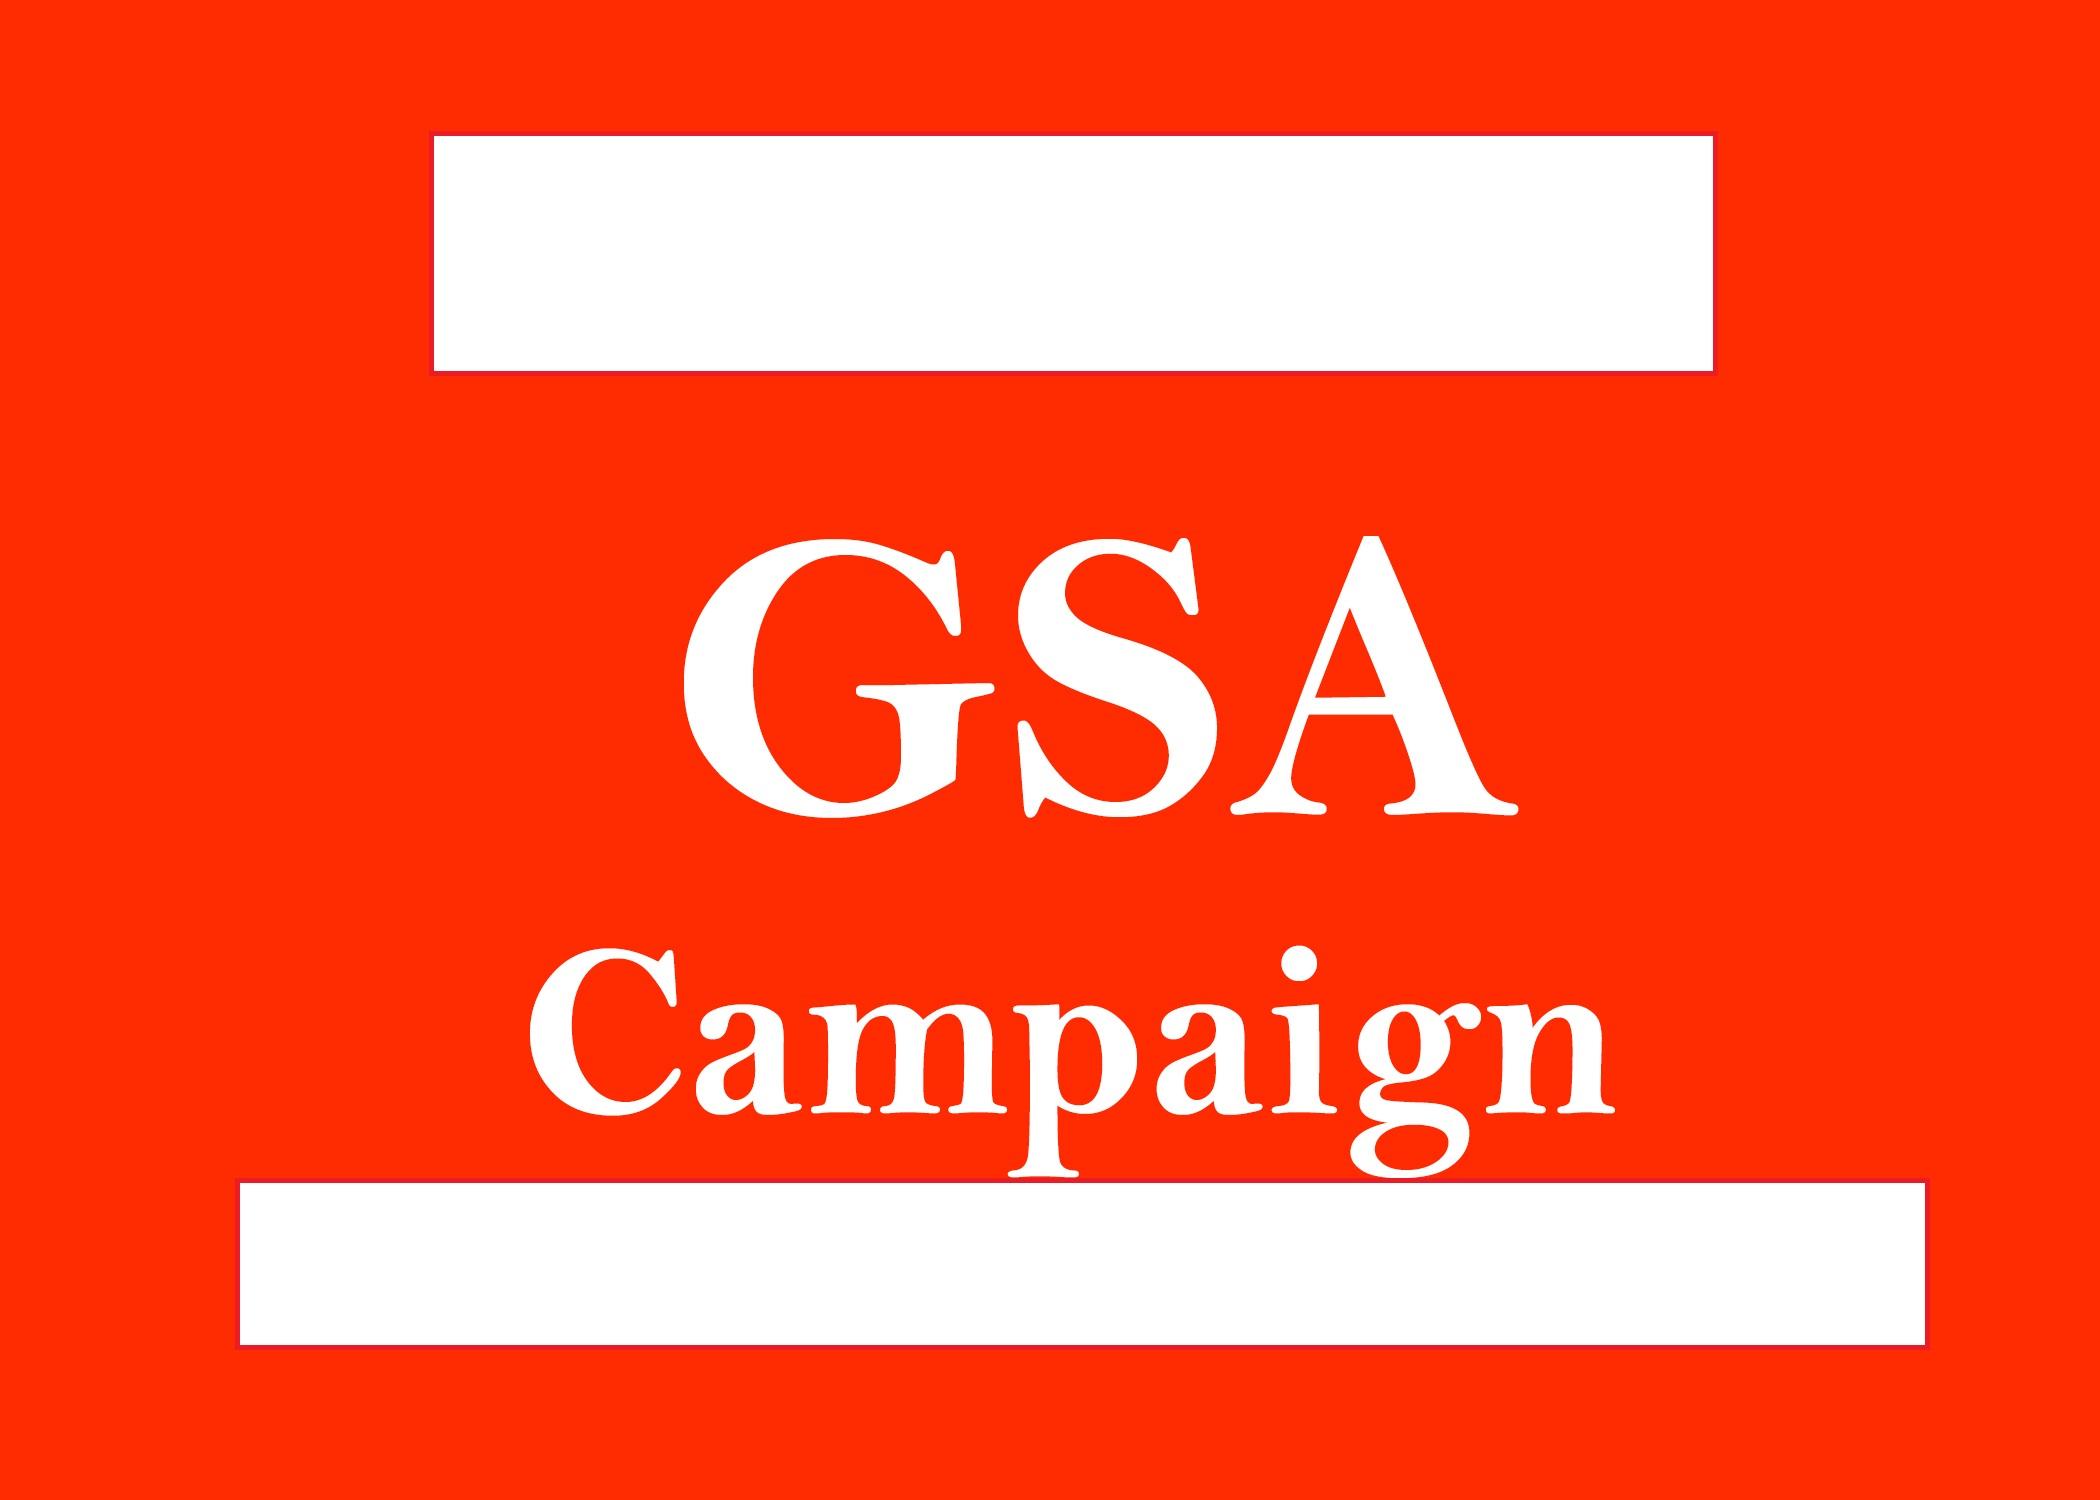 Gsa,Ser, nseo Backlinks Campaign